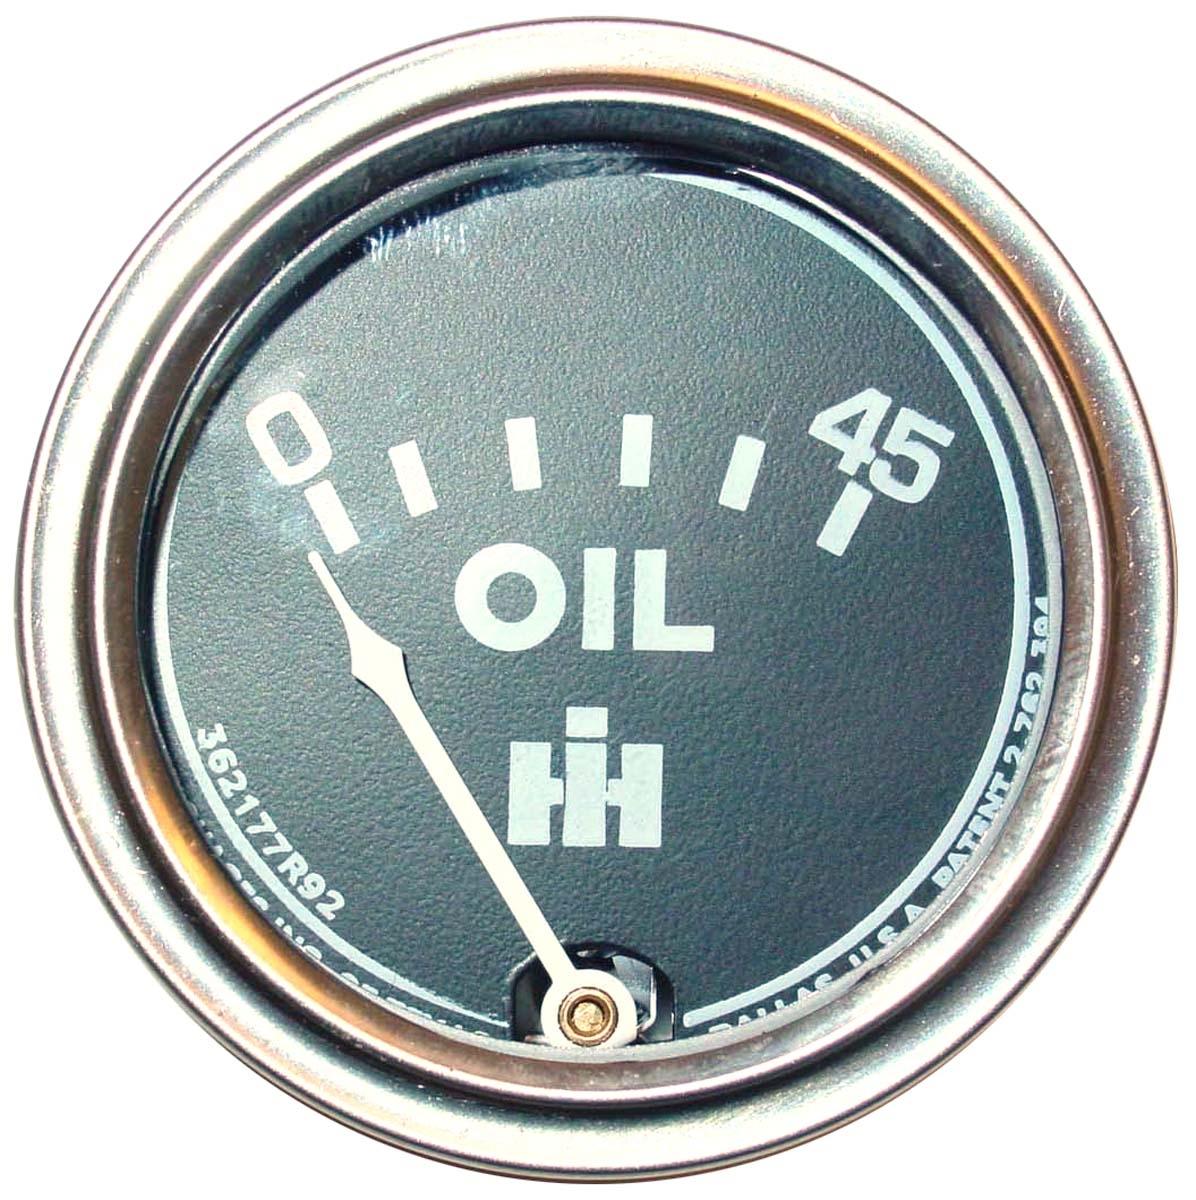 OIL PRESSURE GAUGE- 0-45lbs  - Farmall oil Gauge 350, 400, 450, 460, 560, 600, 650, 660, 3616 240, etc.